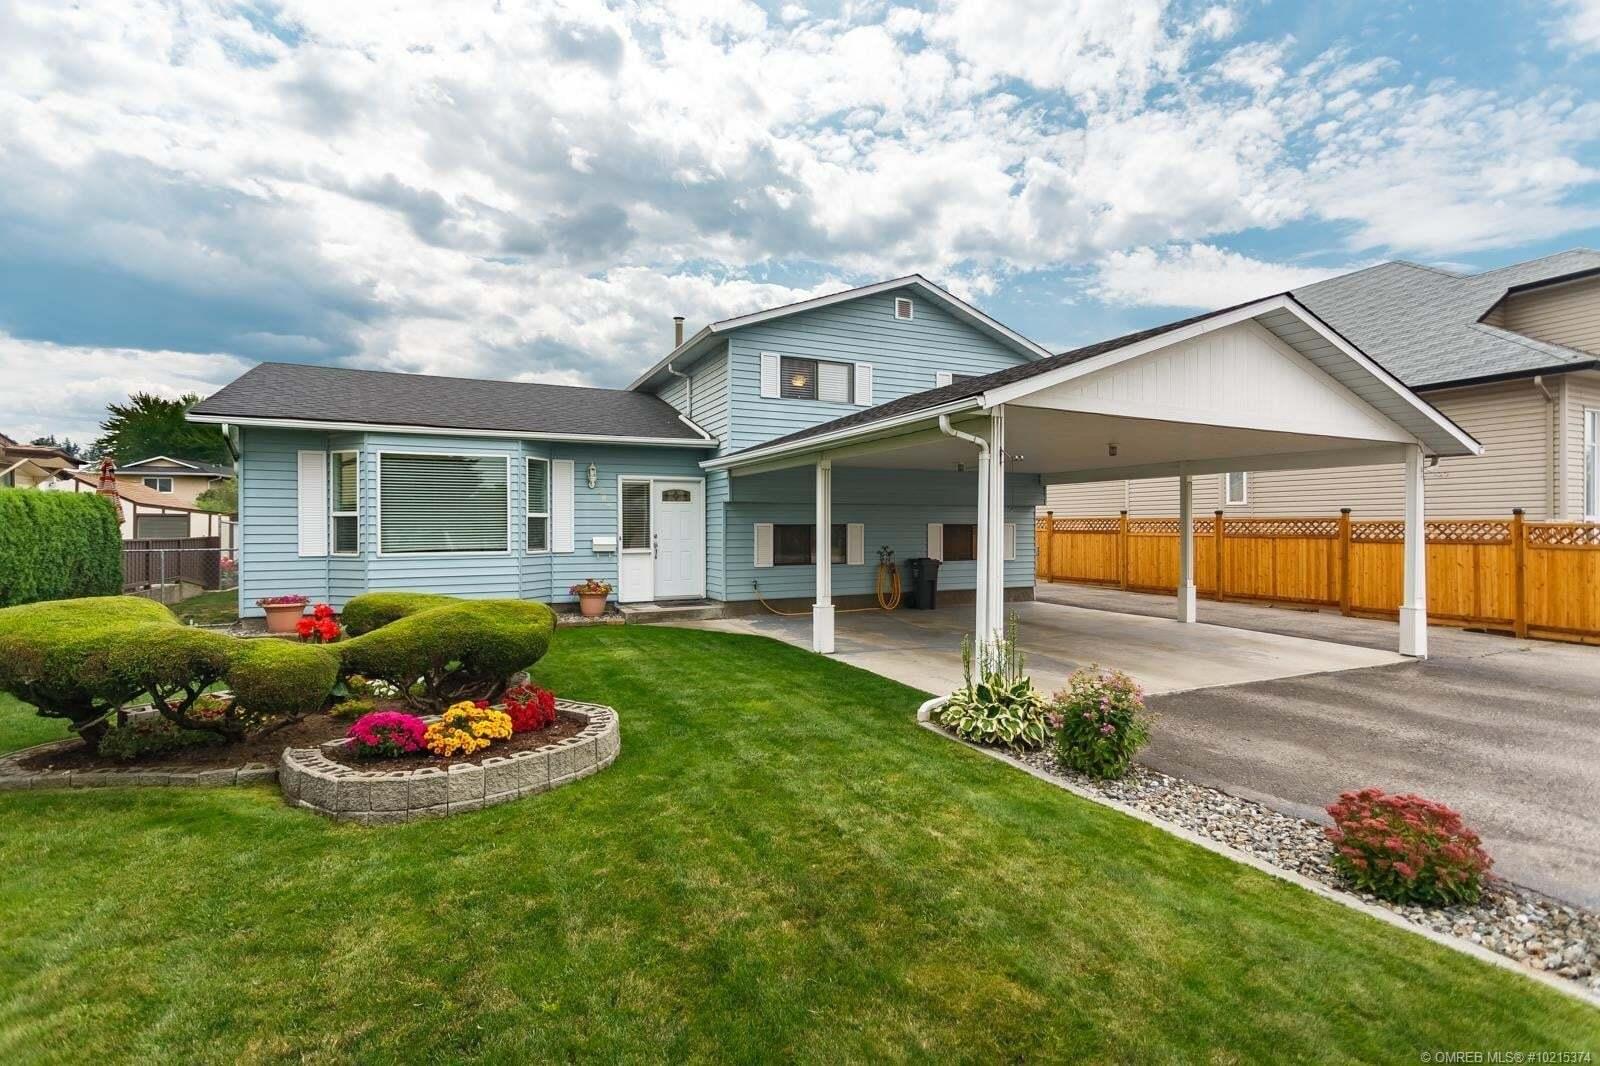 House for sale at 289 Fitzpatrick Rd Kelowna British Columbia - MLS: 10215374